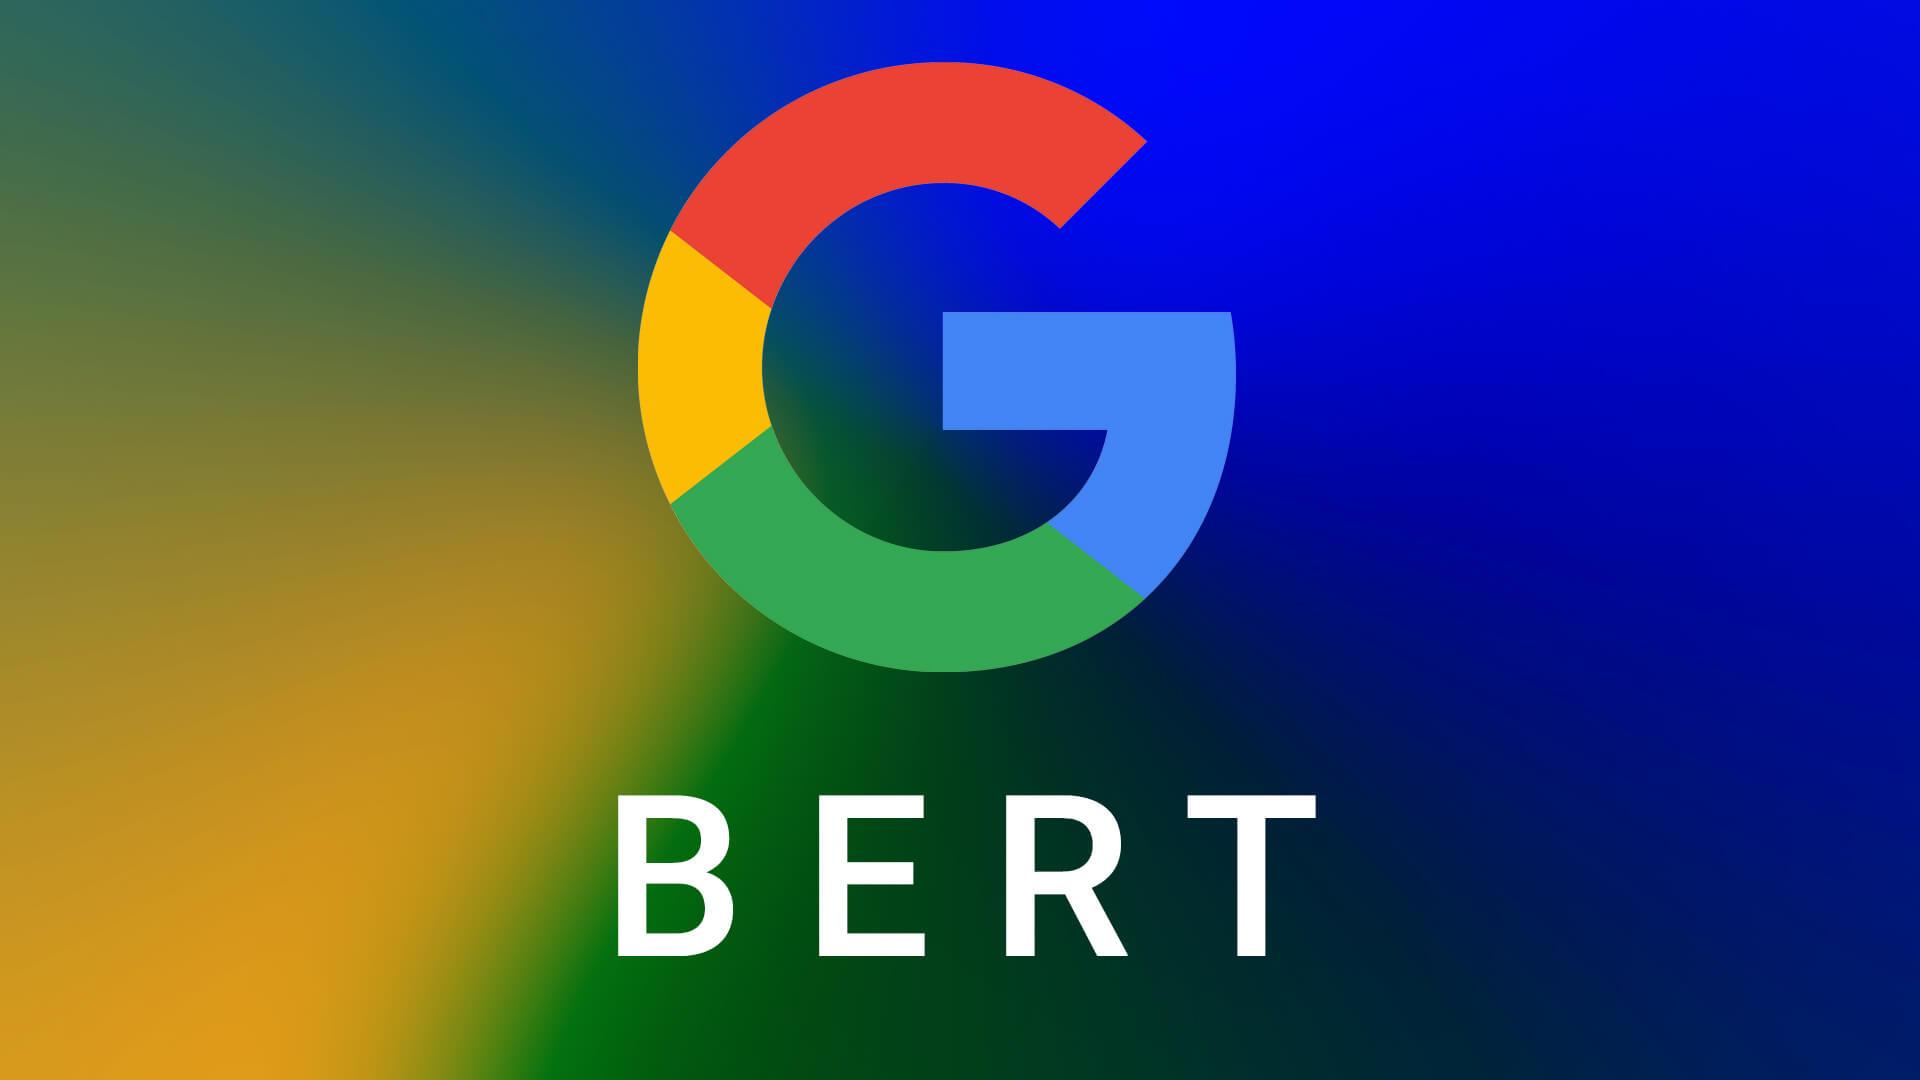 SEO - A deep dive into BERT: How BERT launched a rocket into natural language understanding